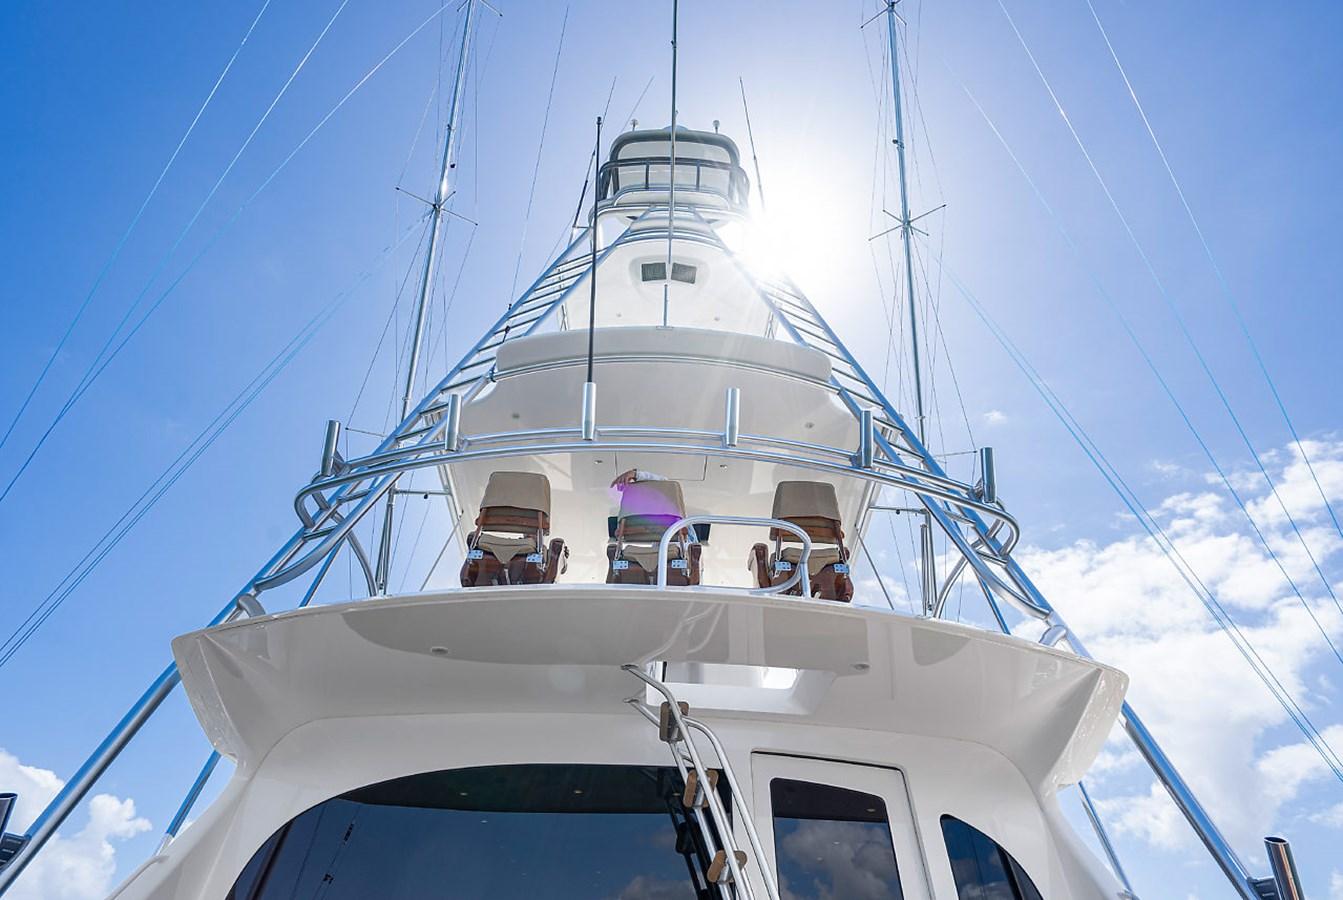 Tower 2014 VIKING Convertible Sport Fisherman 2895551